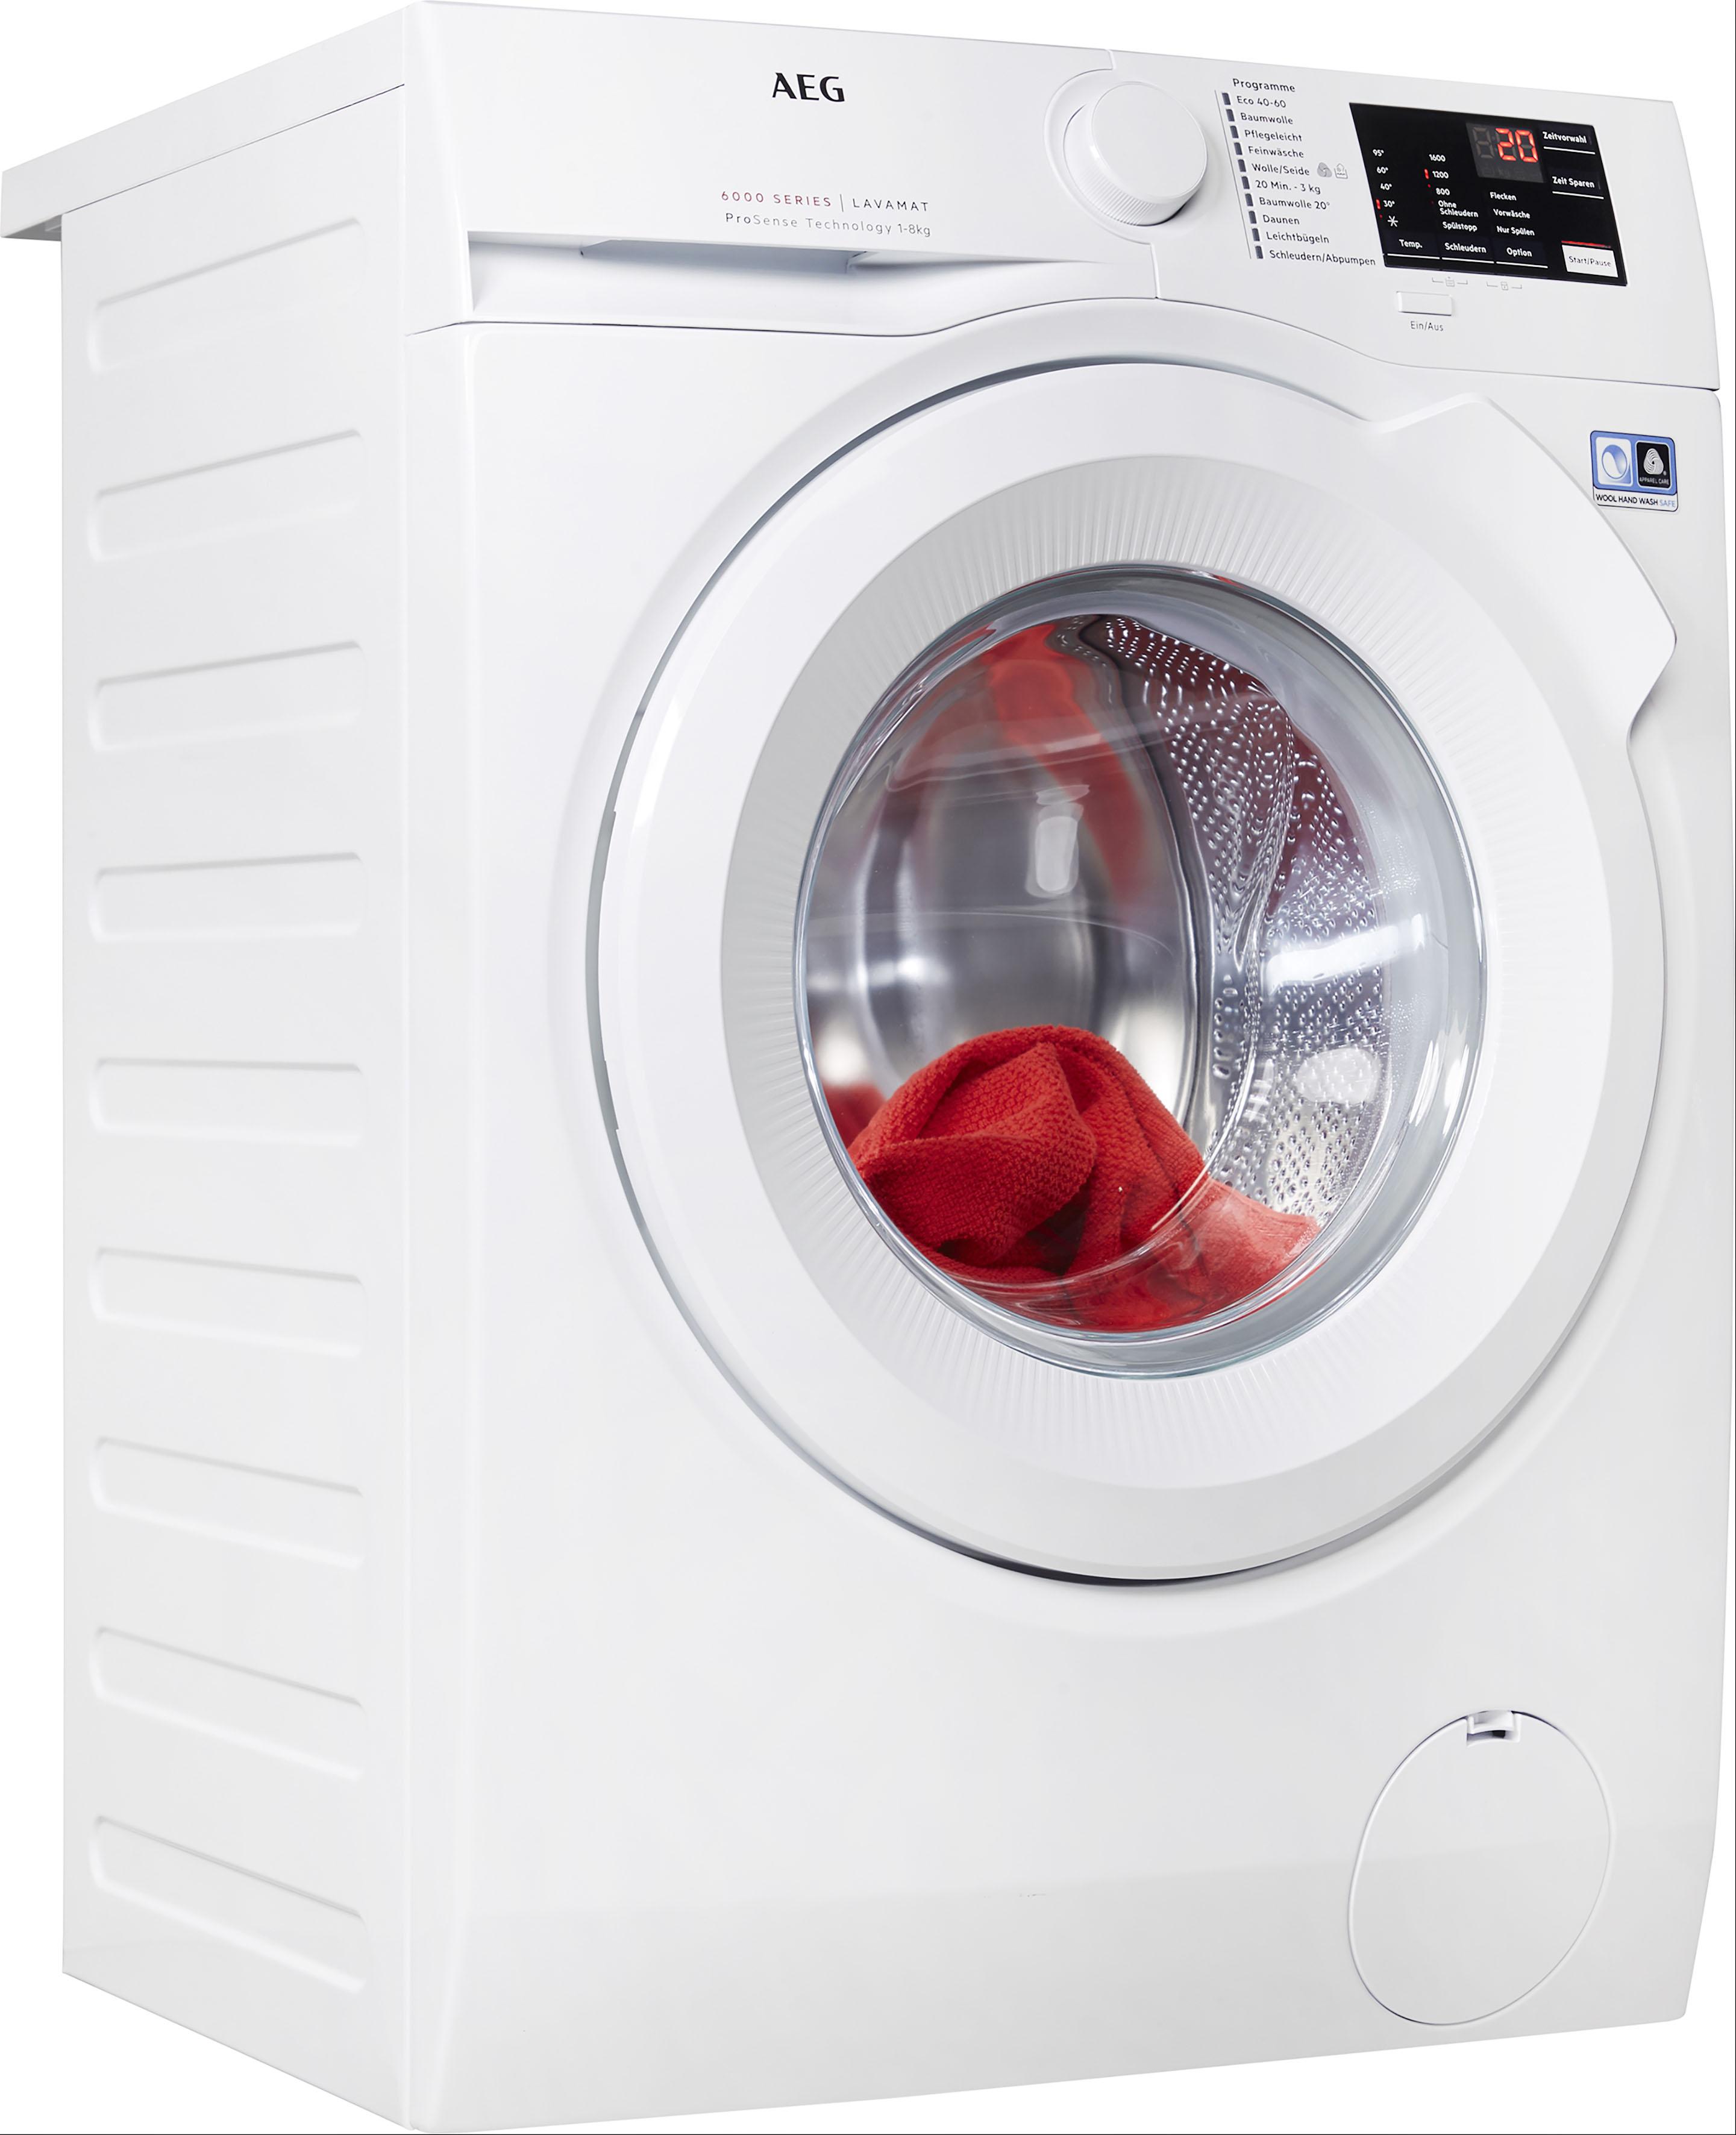 AEG Waschmaschine, L6FBA5680 EEK A+++ weiß Waschmaschinen Haushaltsgeräte Waschmaschine